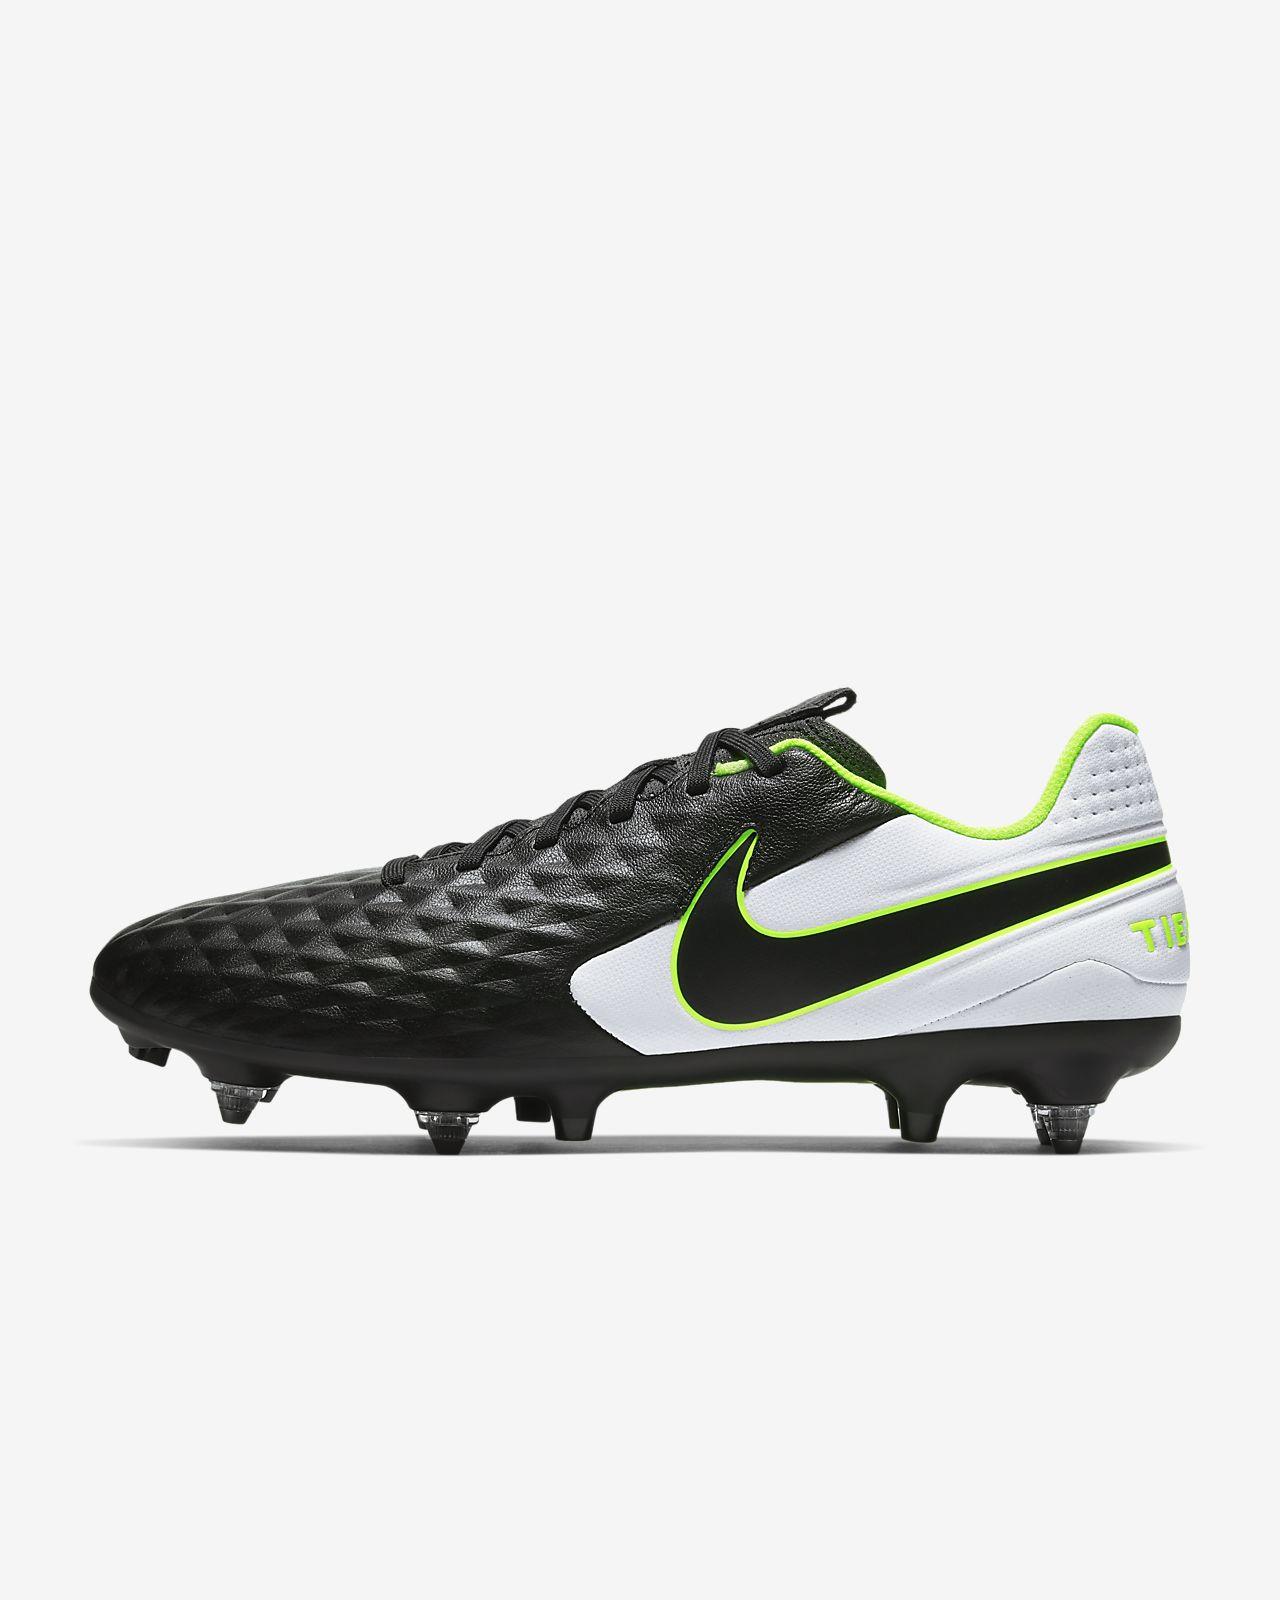 Nike Tiempo Legend 7 Elite SG PRO AC Boots